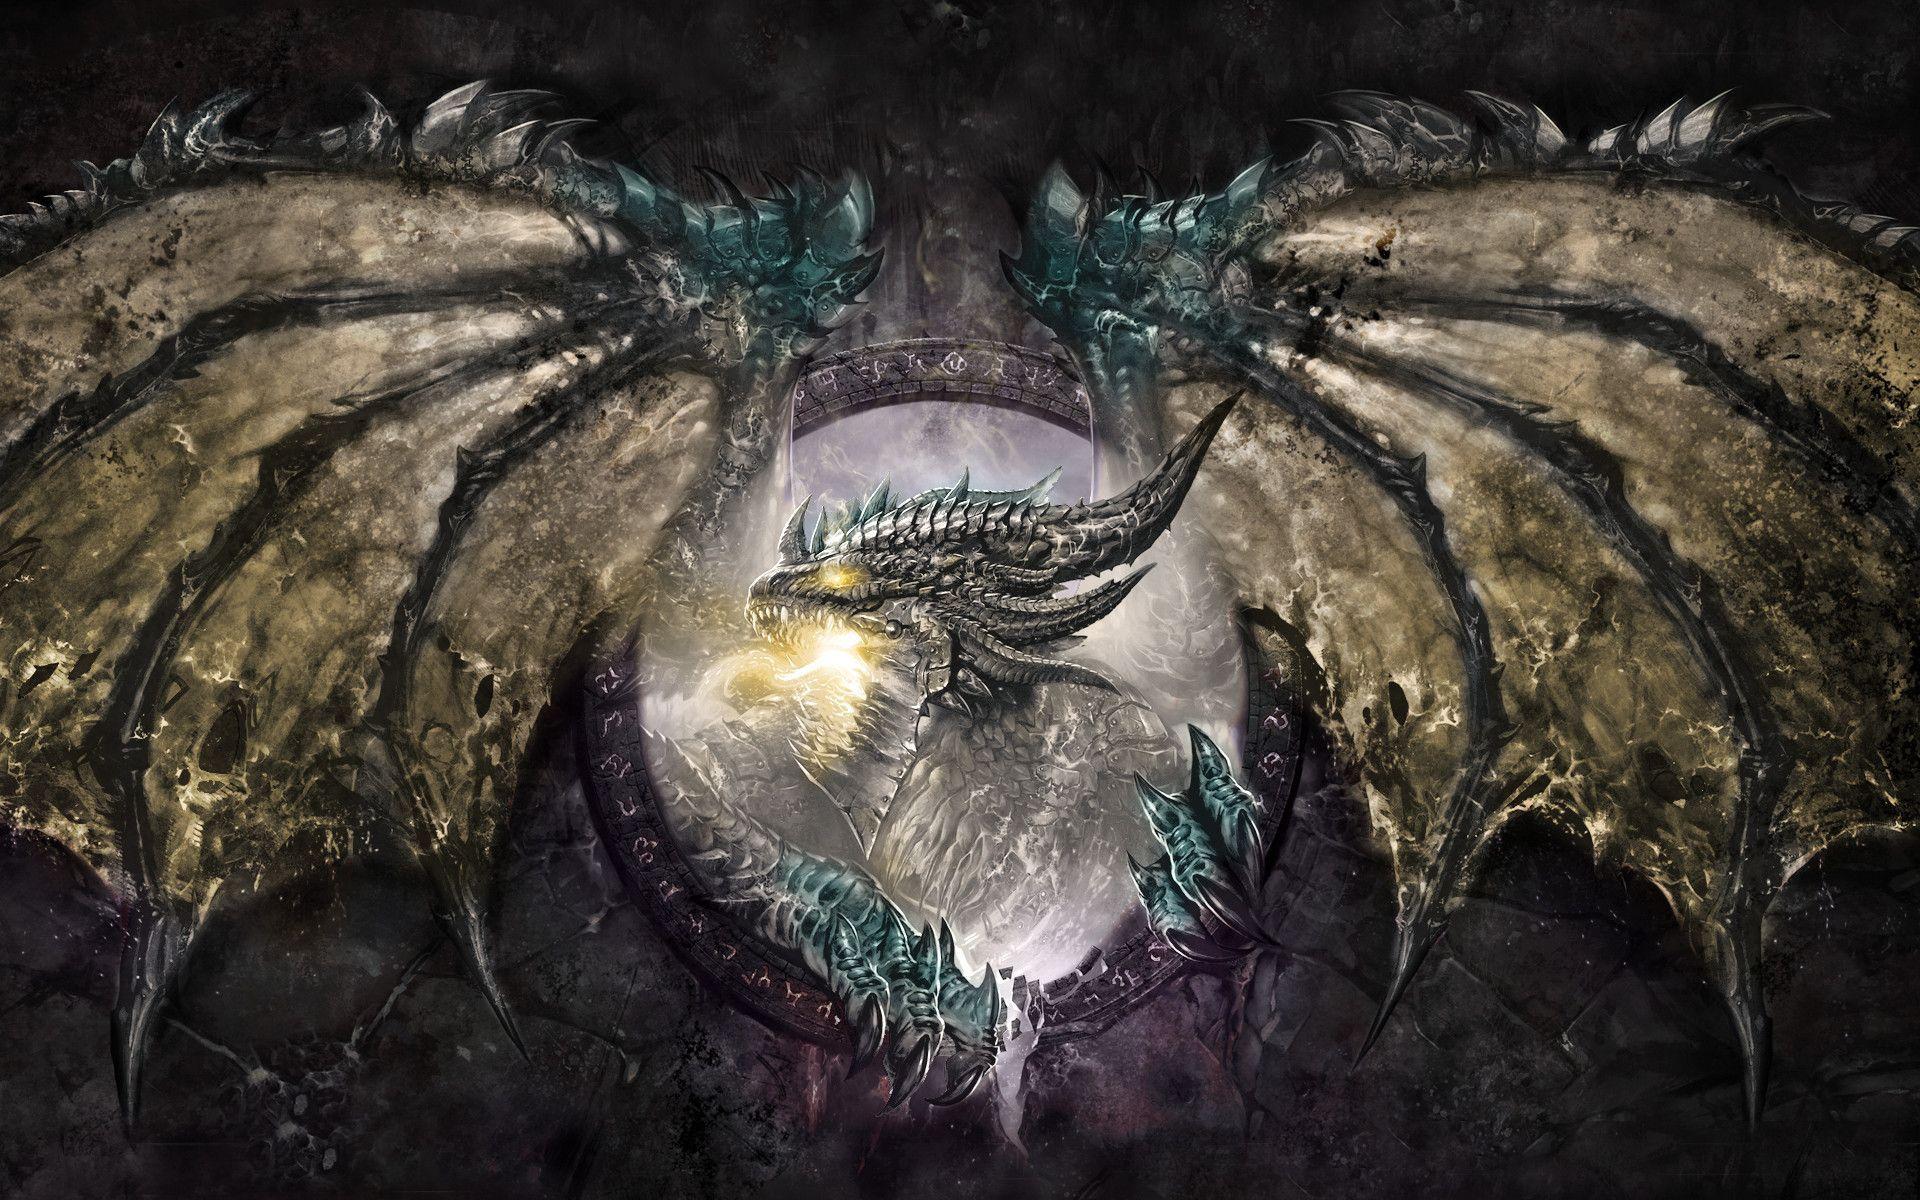 World of Warcraft Dragon Fond d'écran HD   Arrière-Plan   1920x1200   ID:699627 - Wallpaper Abyss